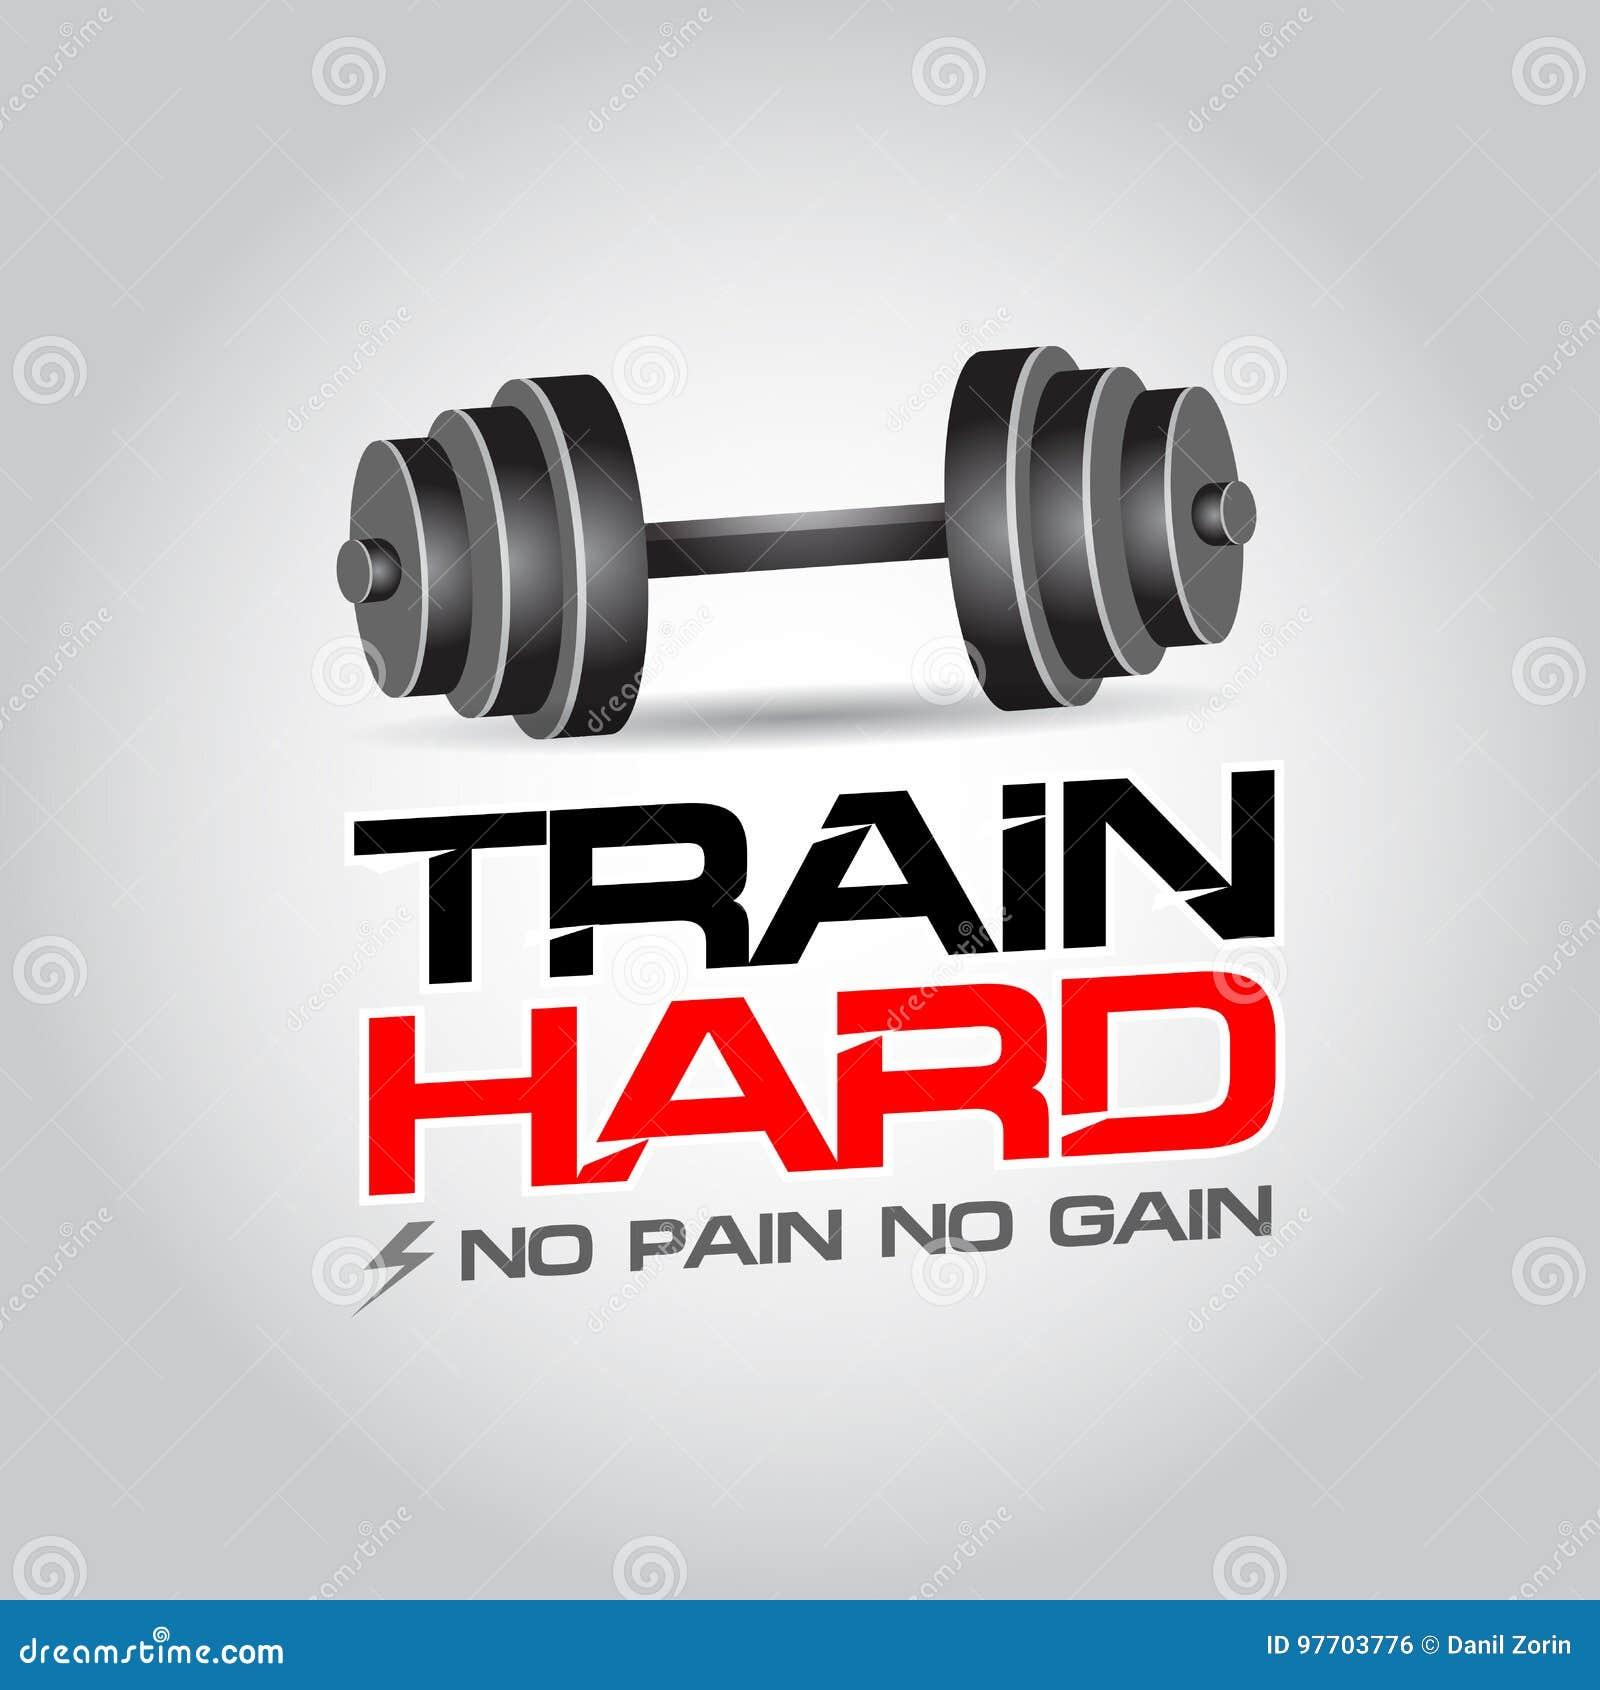 Train Hard Fitness Motivation Poster No Pain No Gain Stock